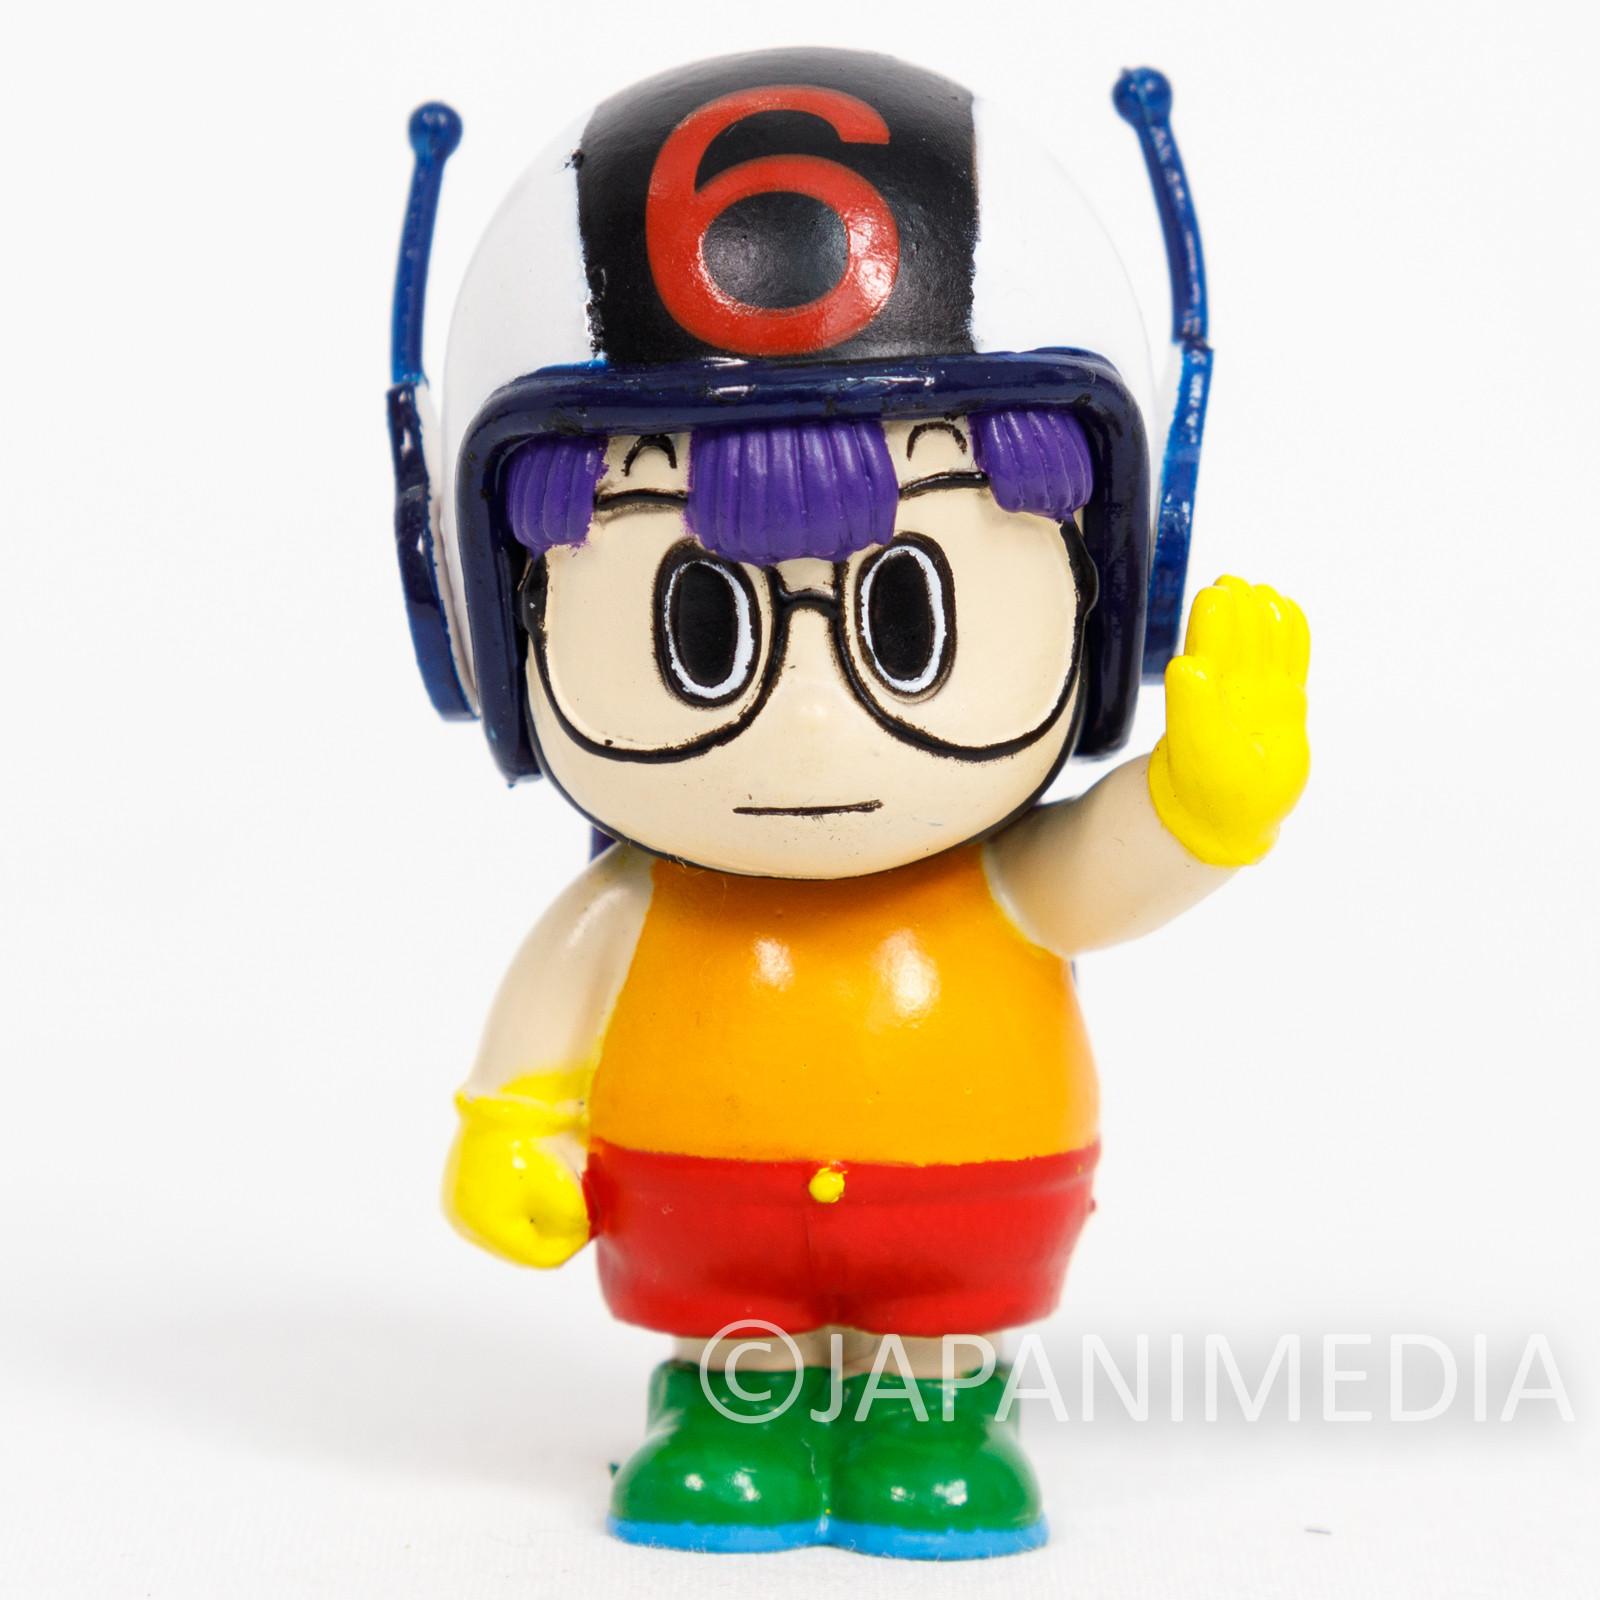 RARE! Dr. Slump Arale Chan Caramel Man No.6 Mini Figure Organic